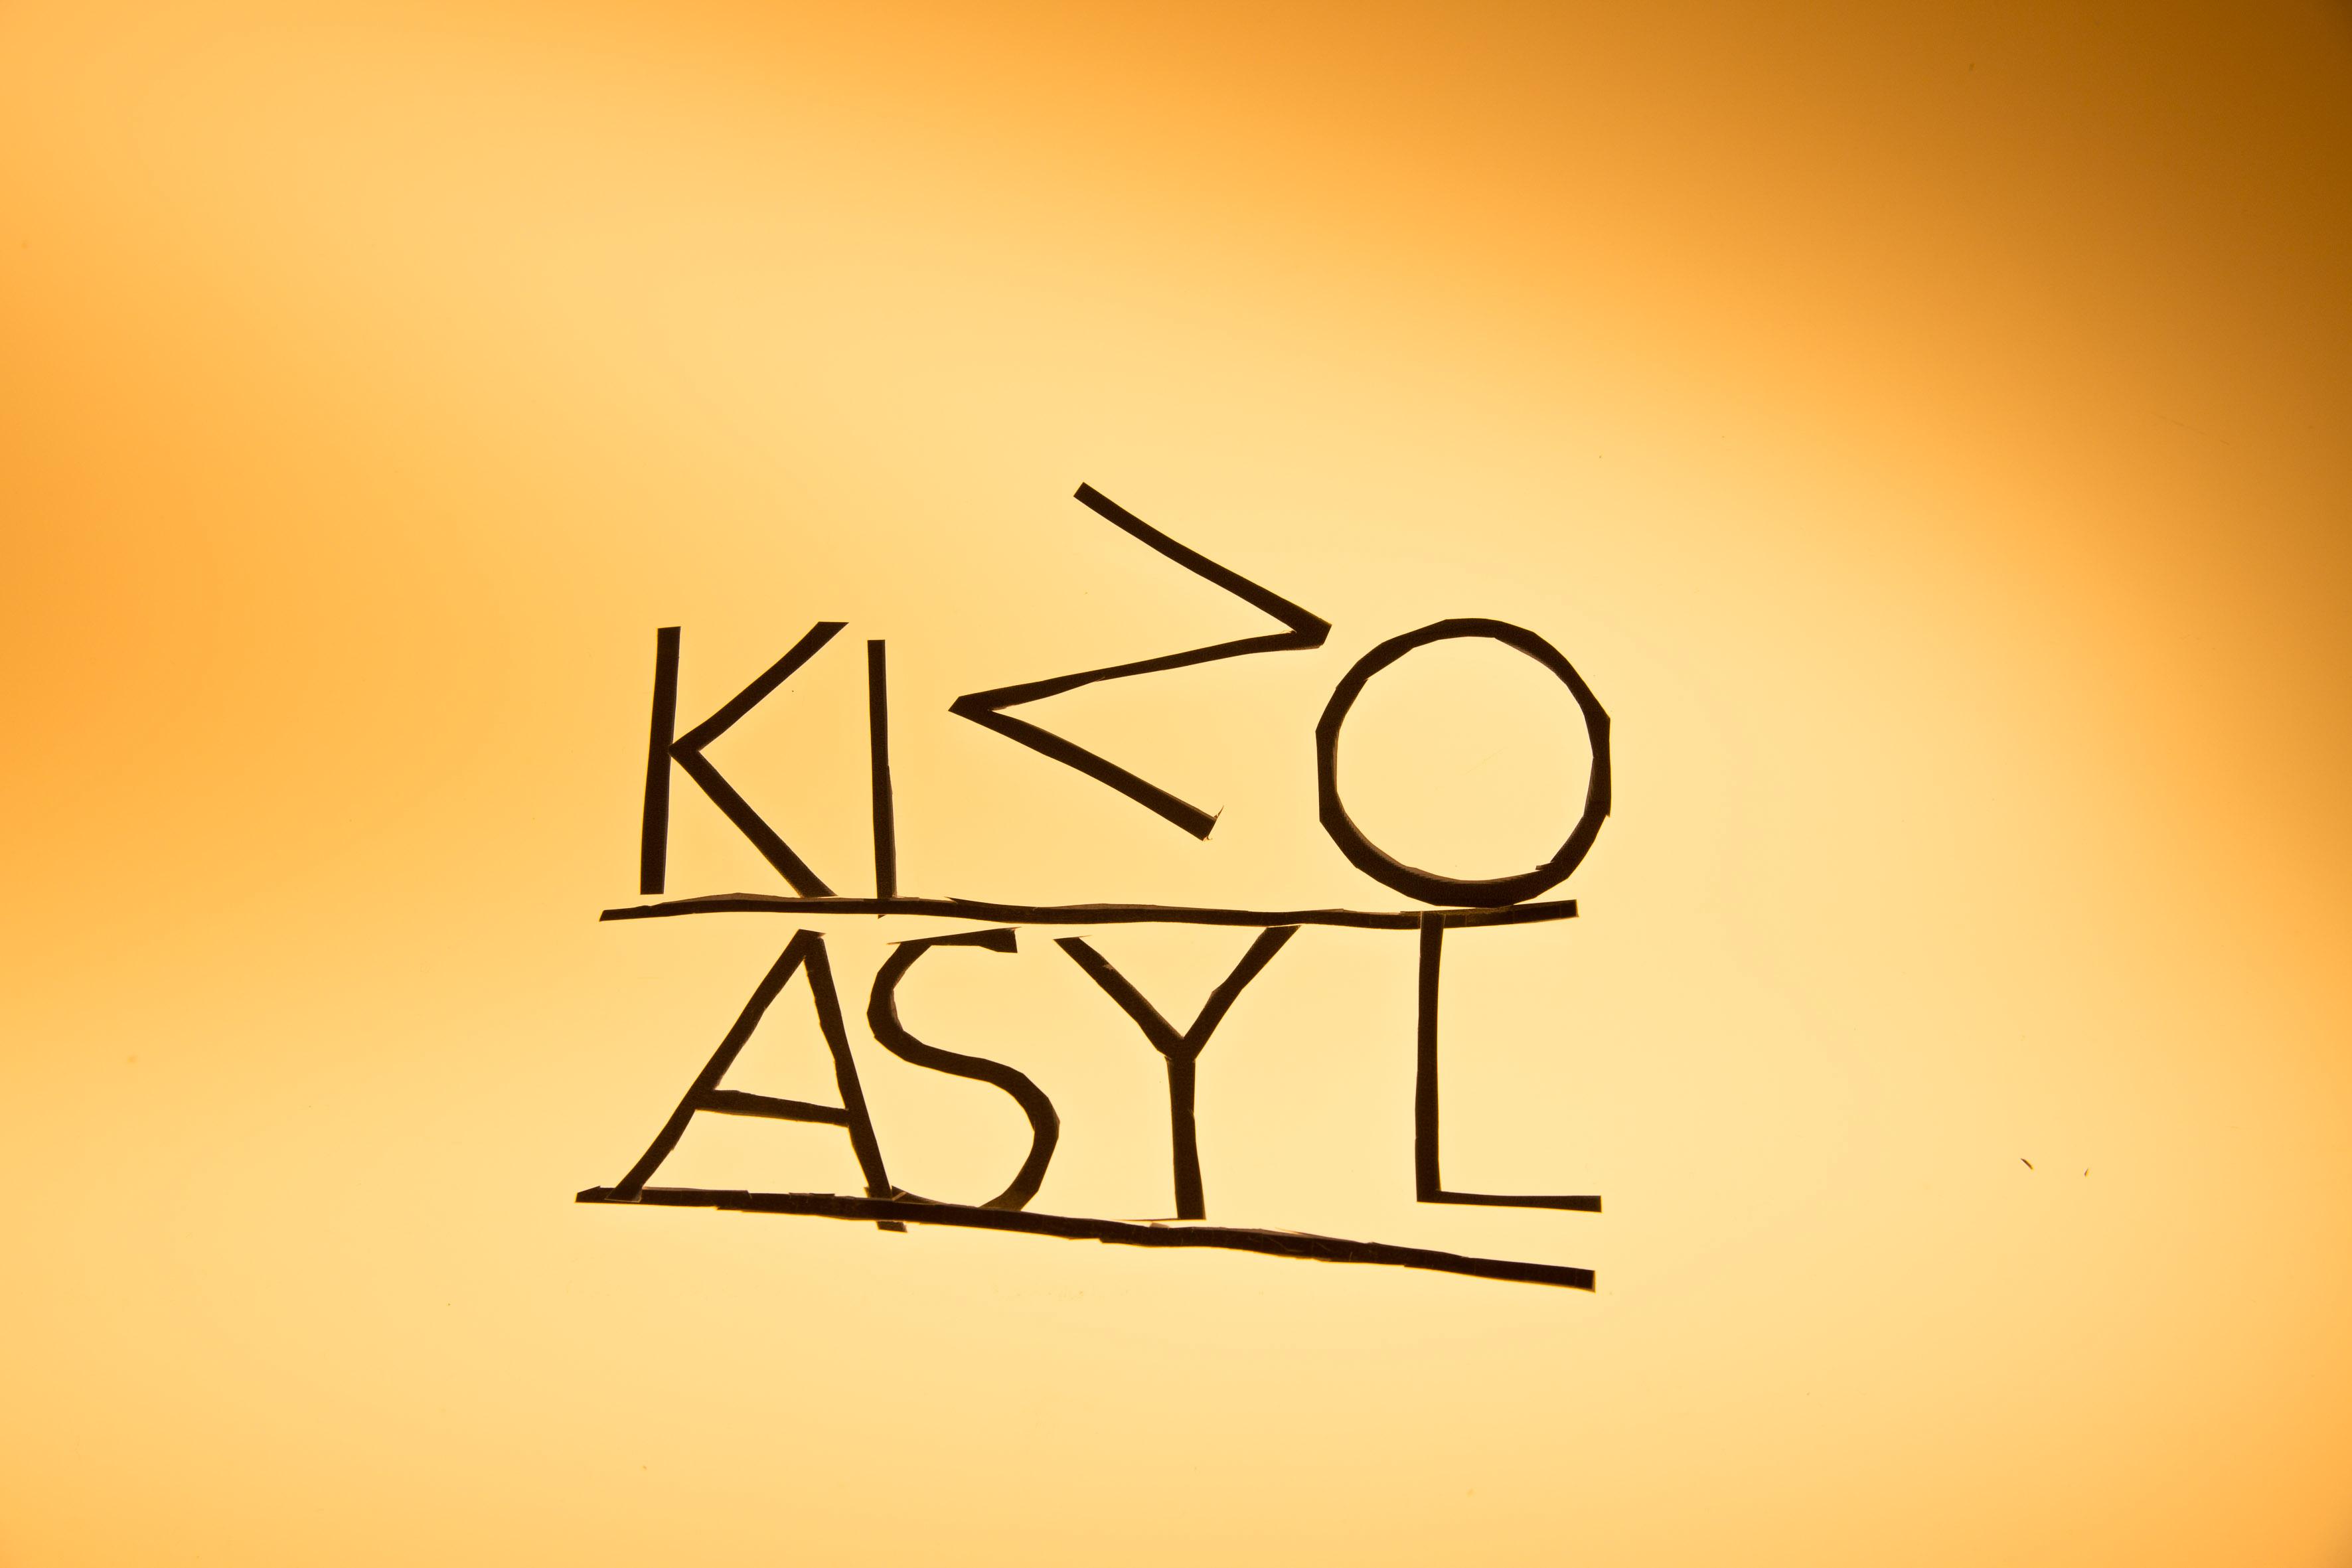 KINO ASYL